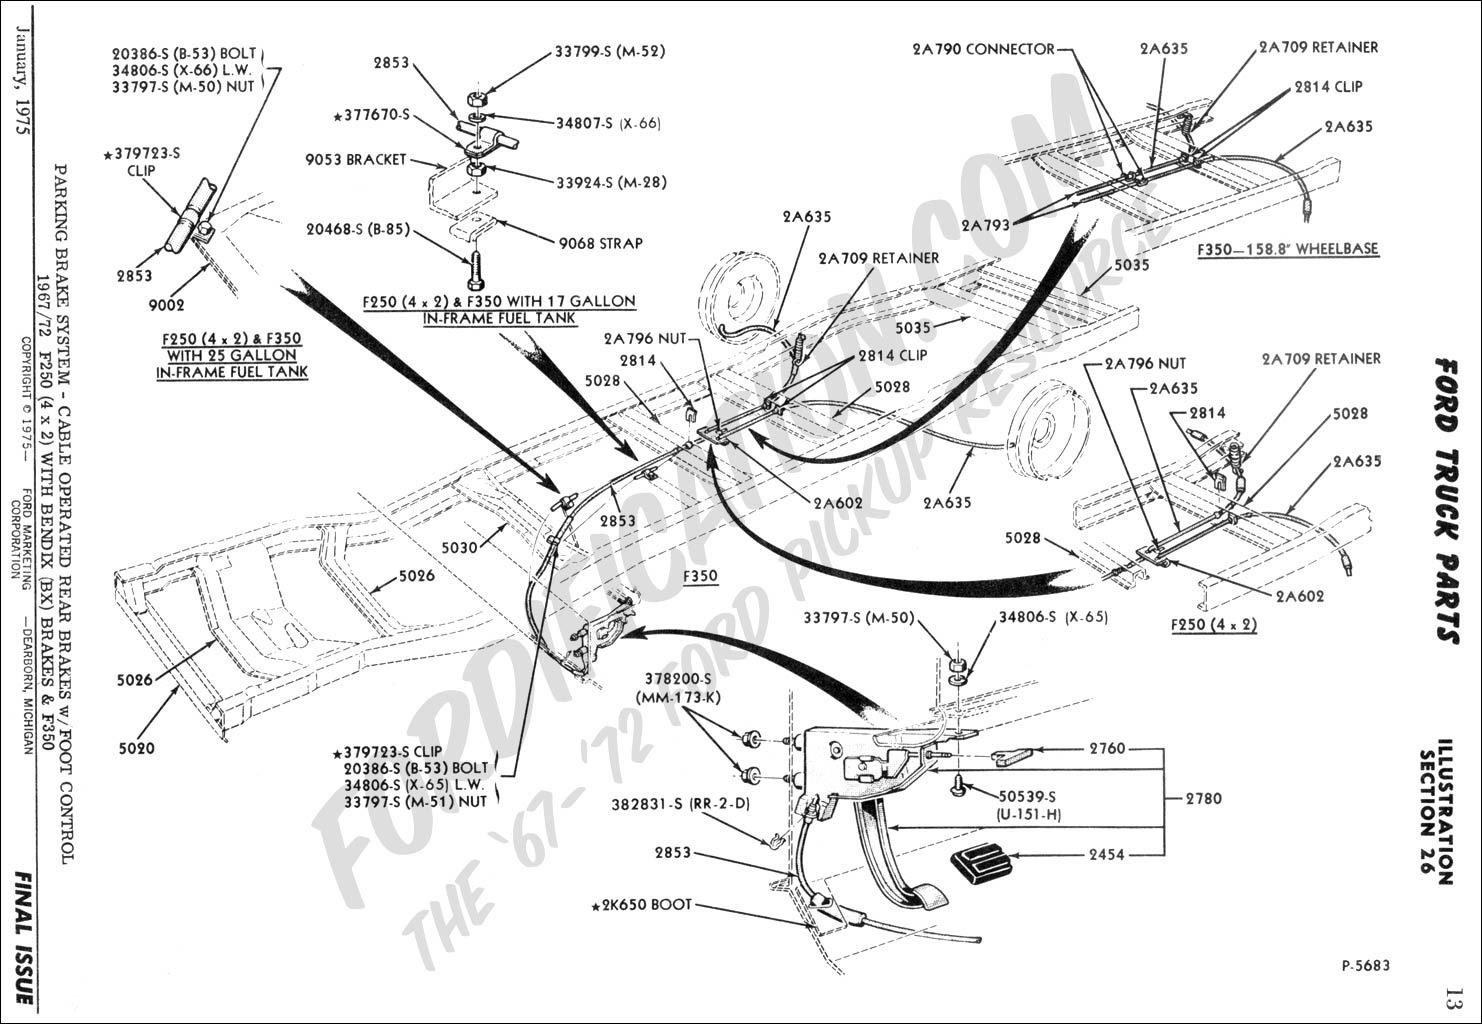 1996 Ford f250 brake line diagram